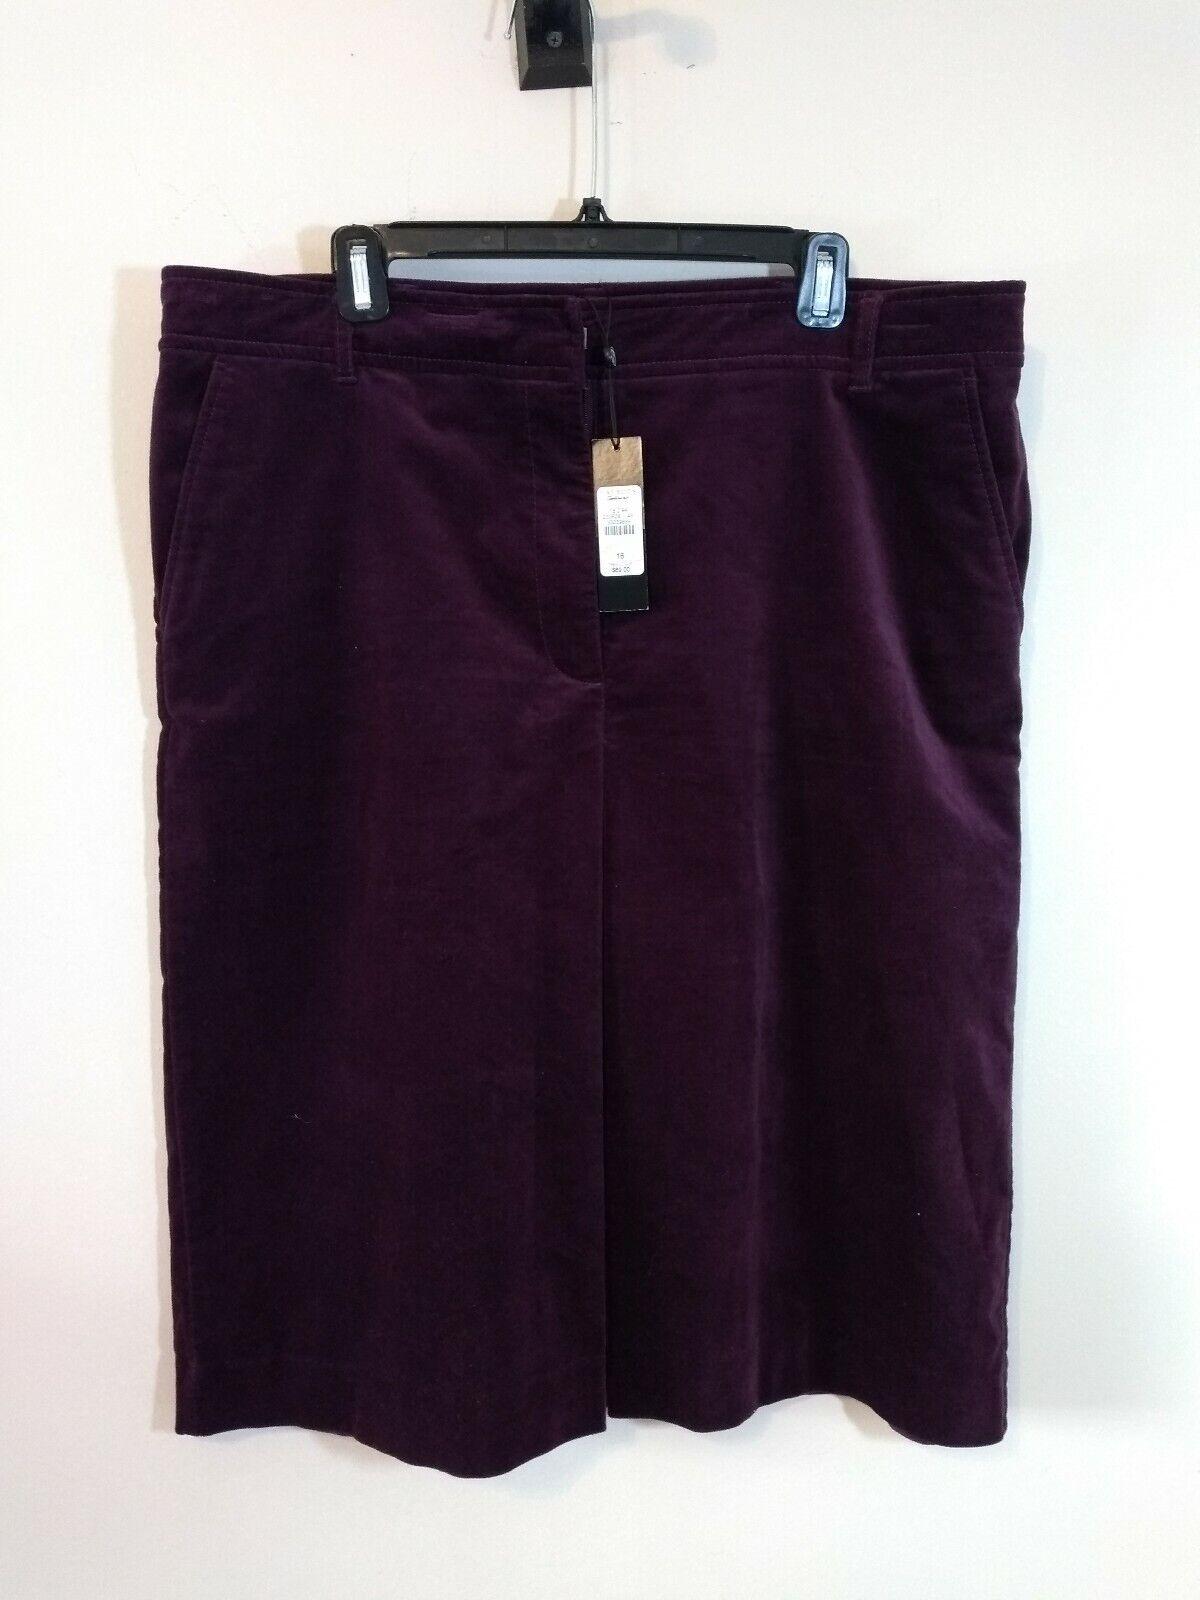 NWT  69 Talbots Purple Velour Skirt Size 16